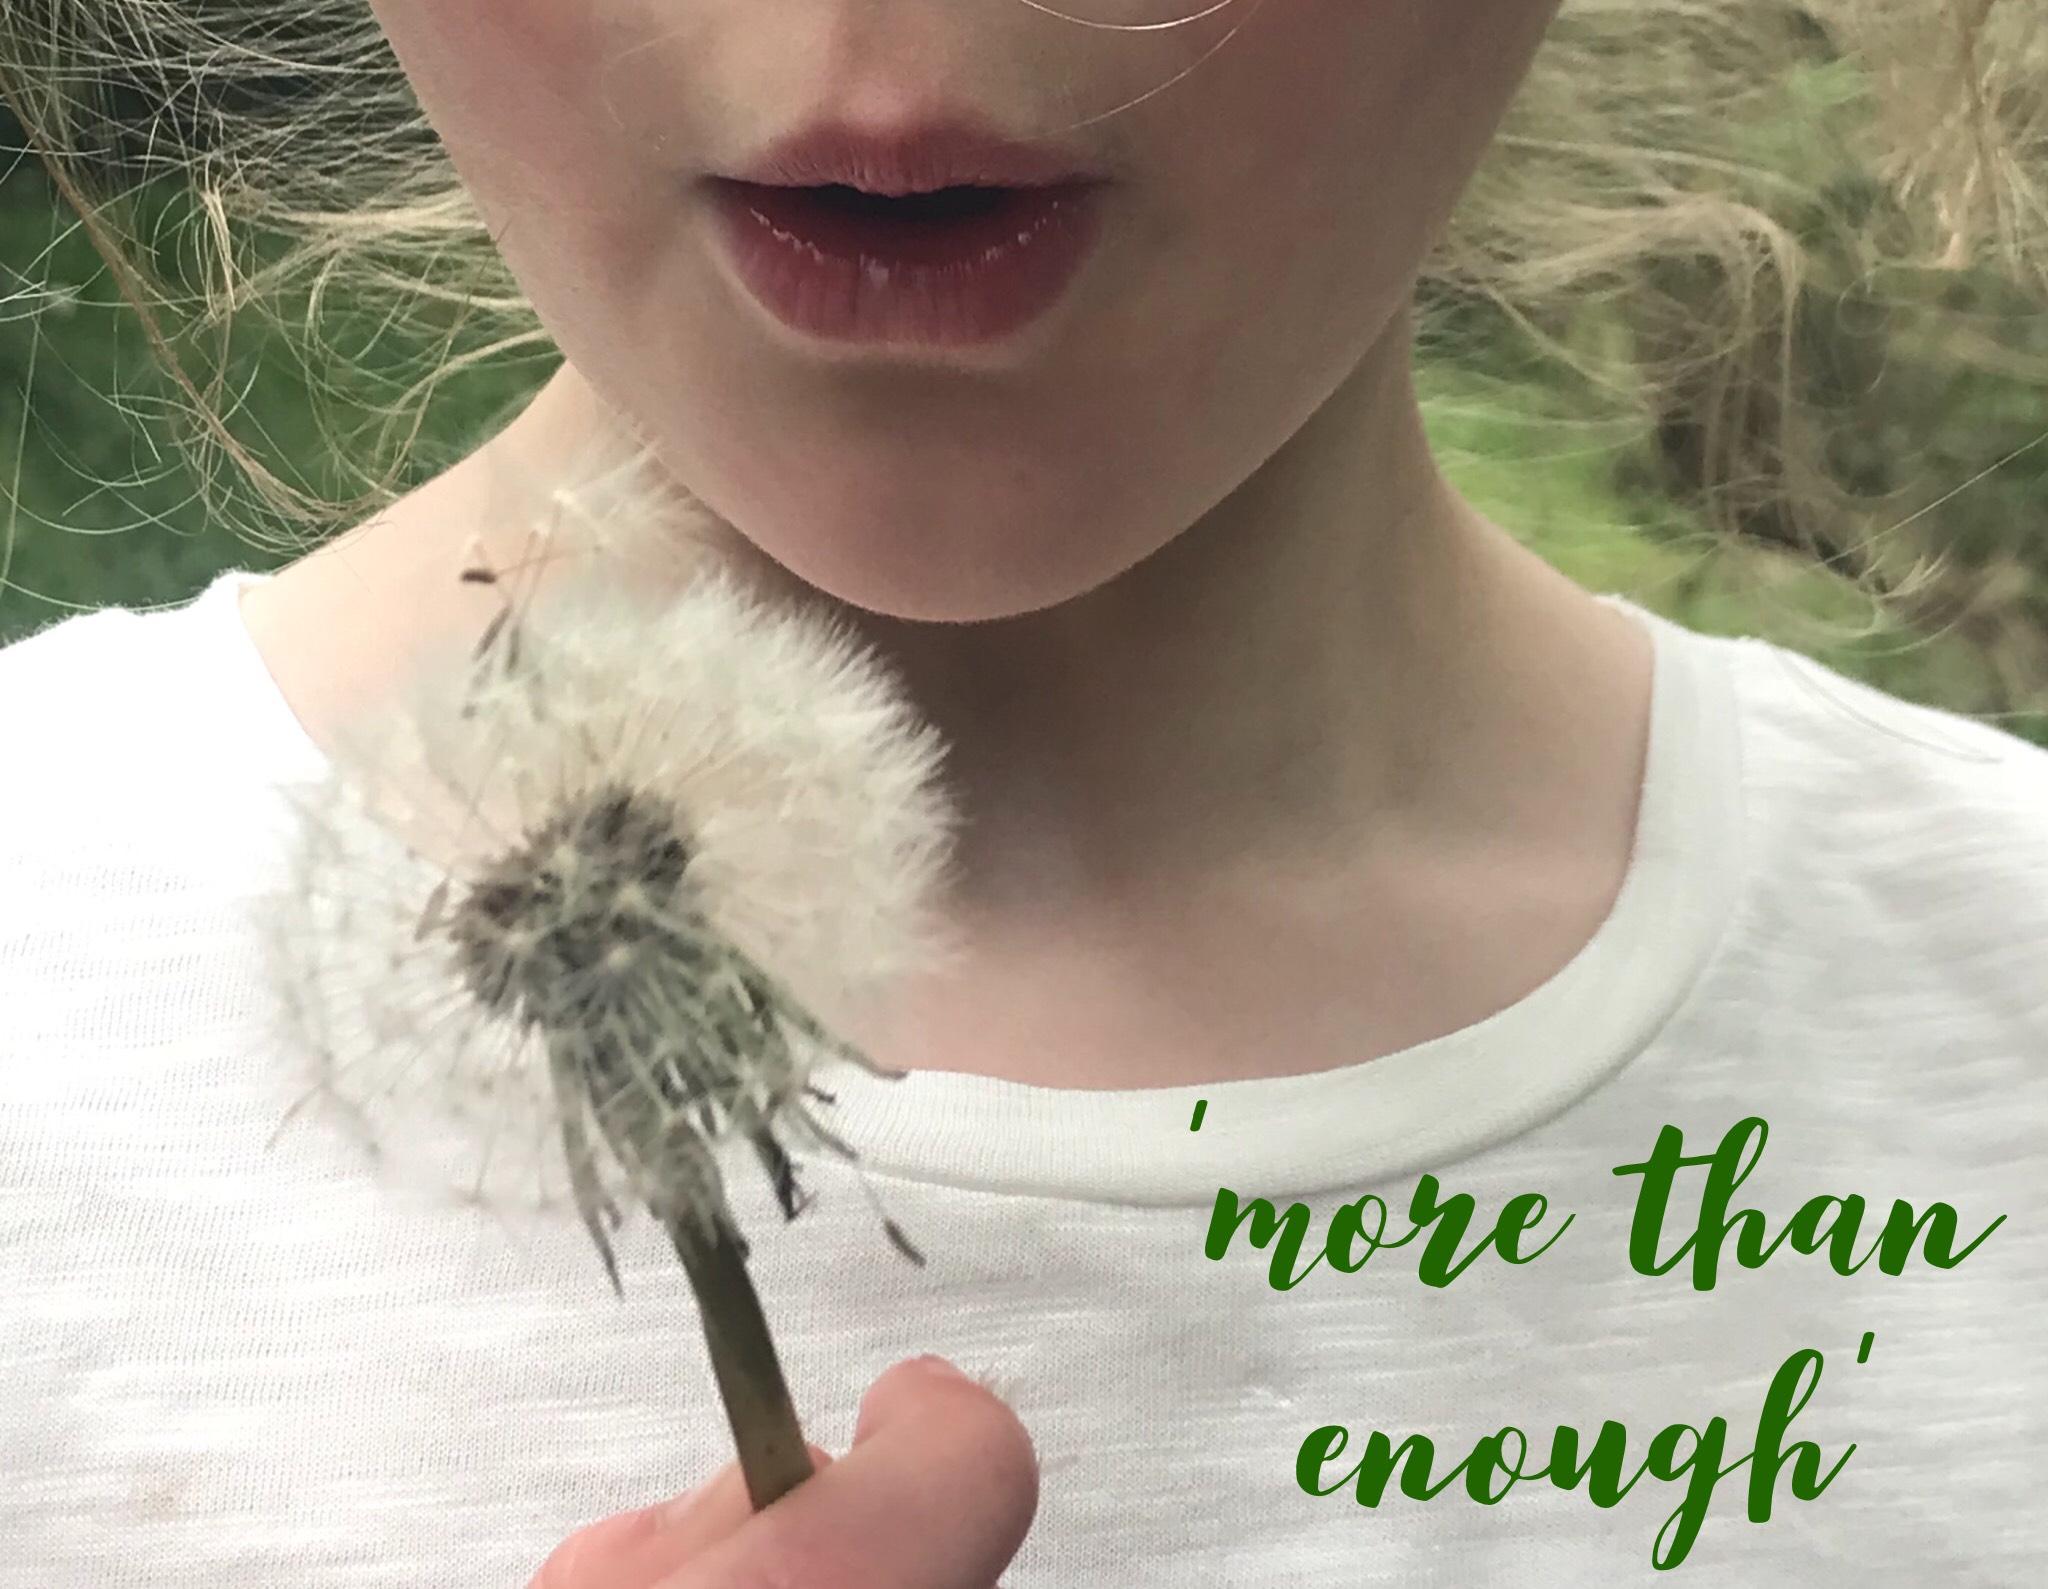 girl with dandelion symbolising gratitude